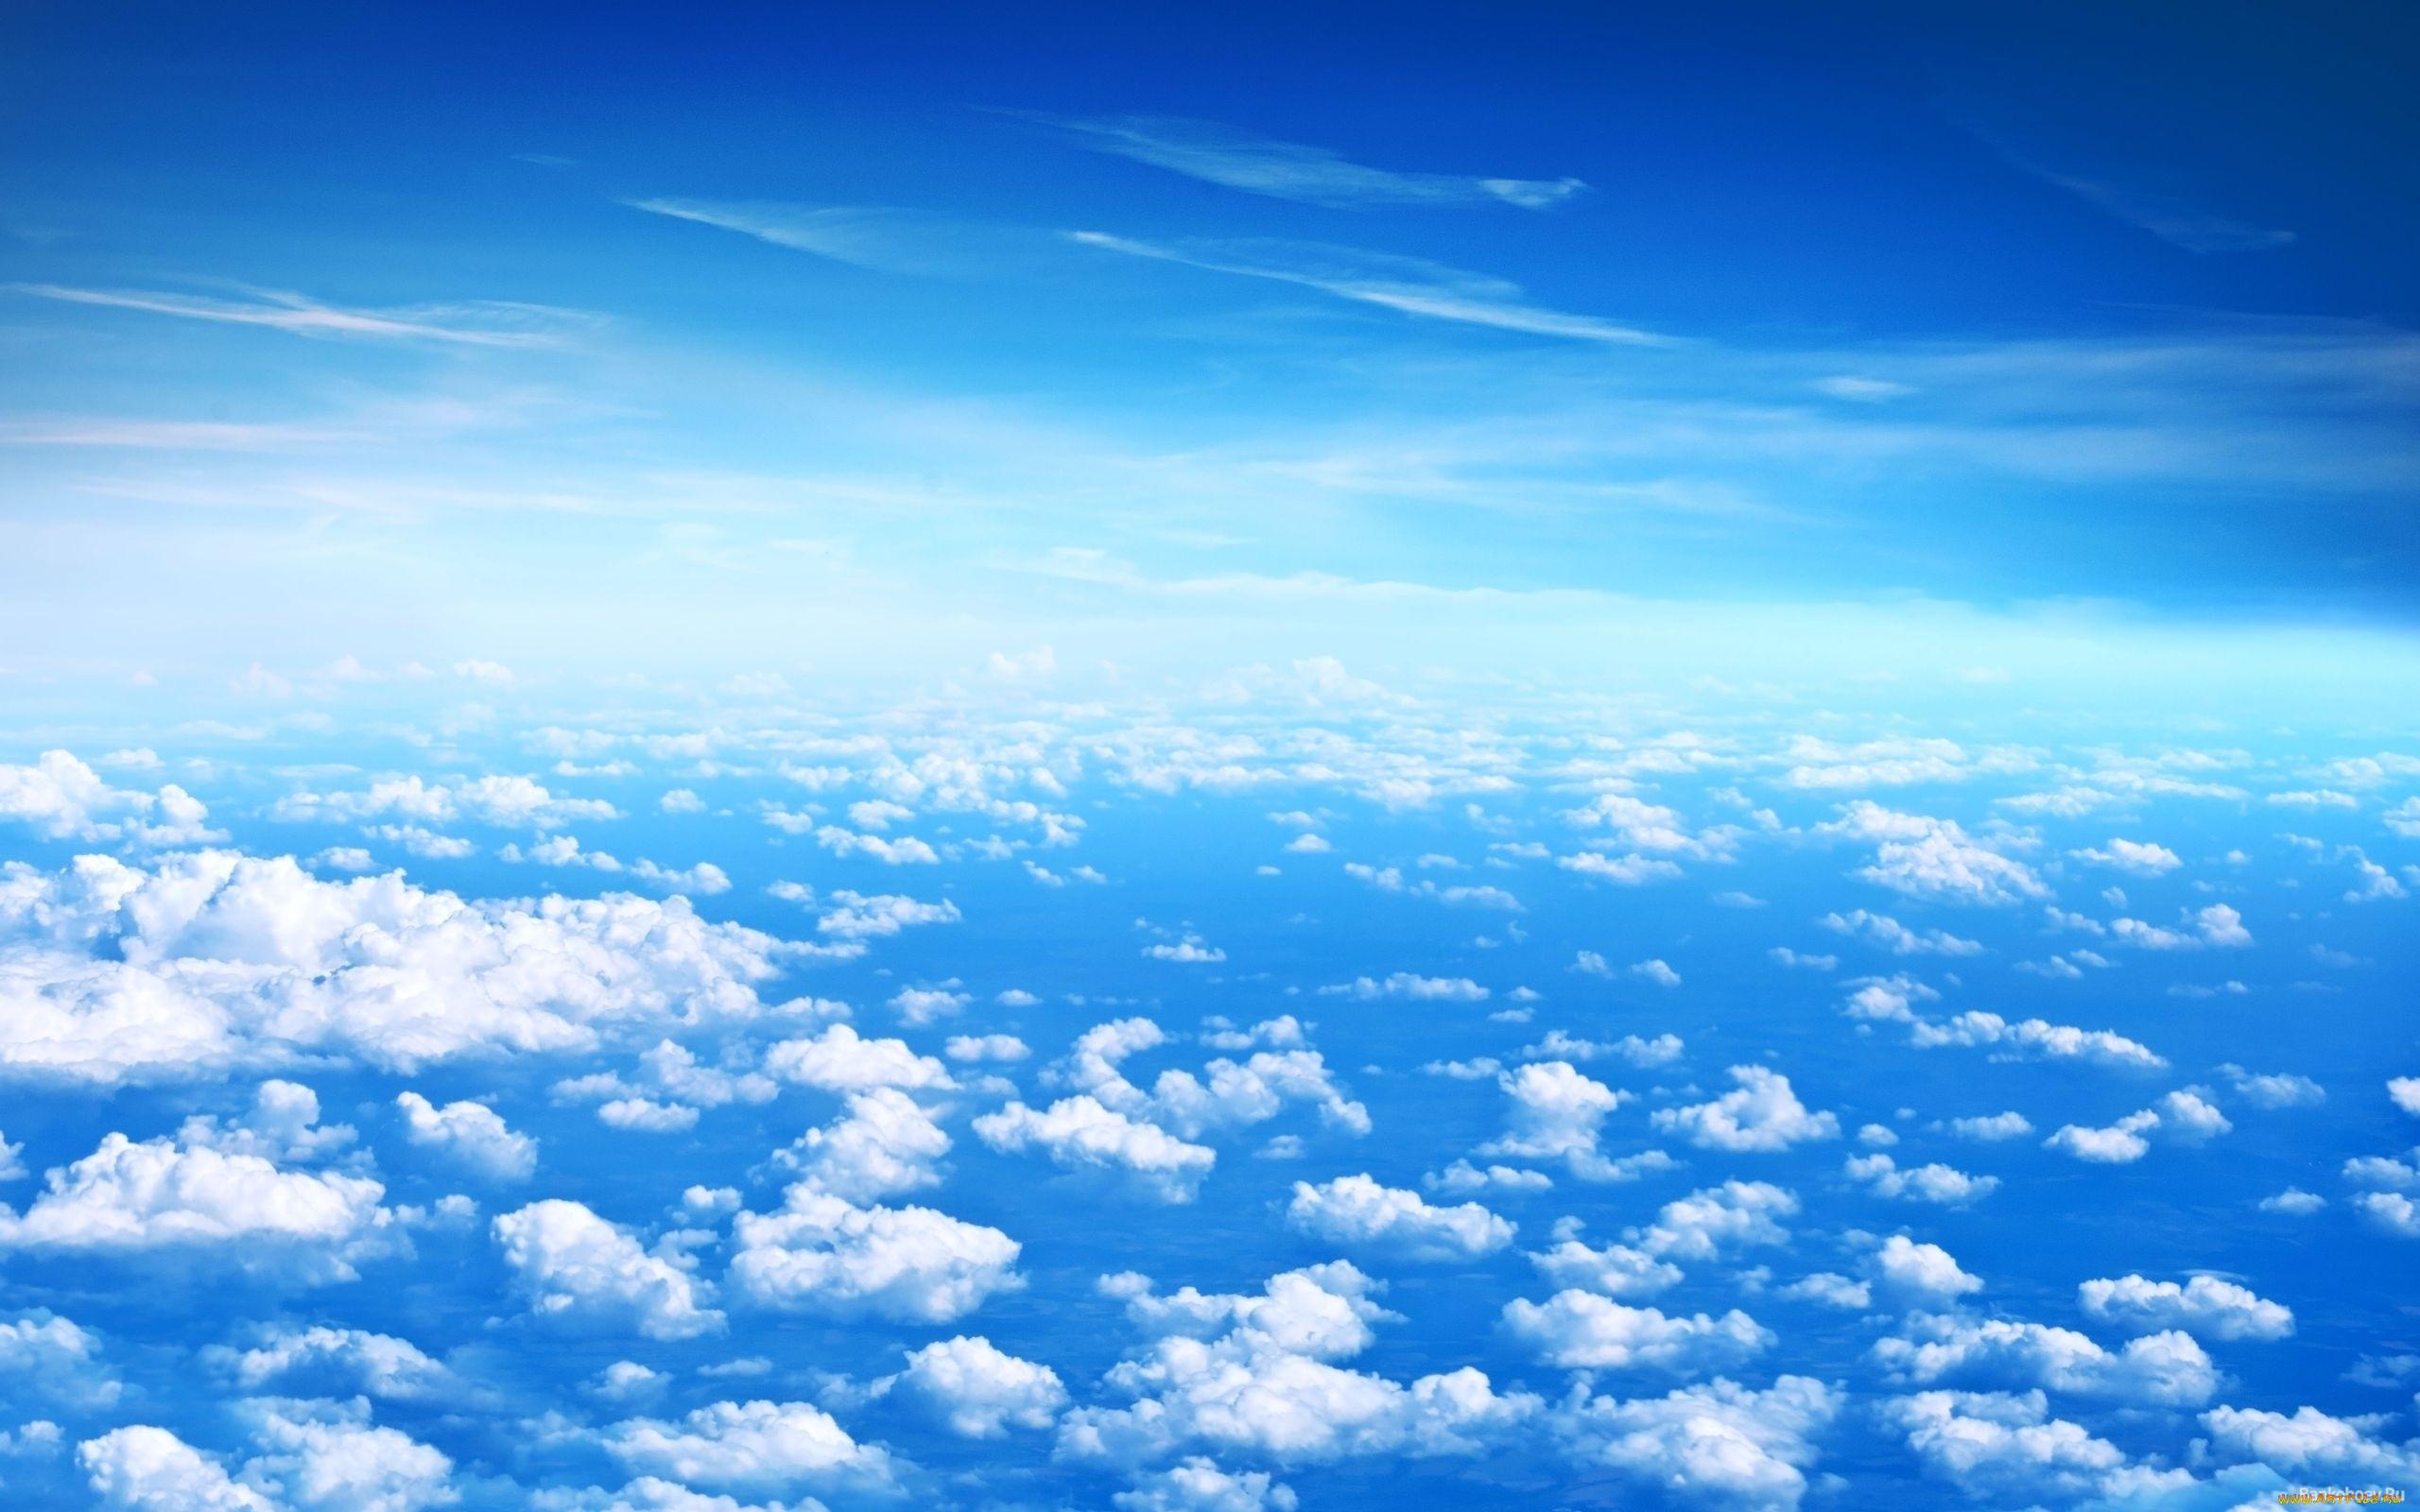 картинки красивое небо с облаками обложке